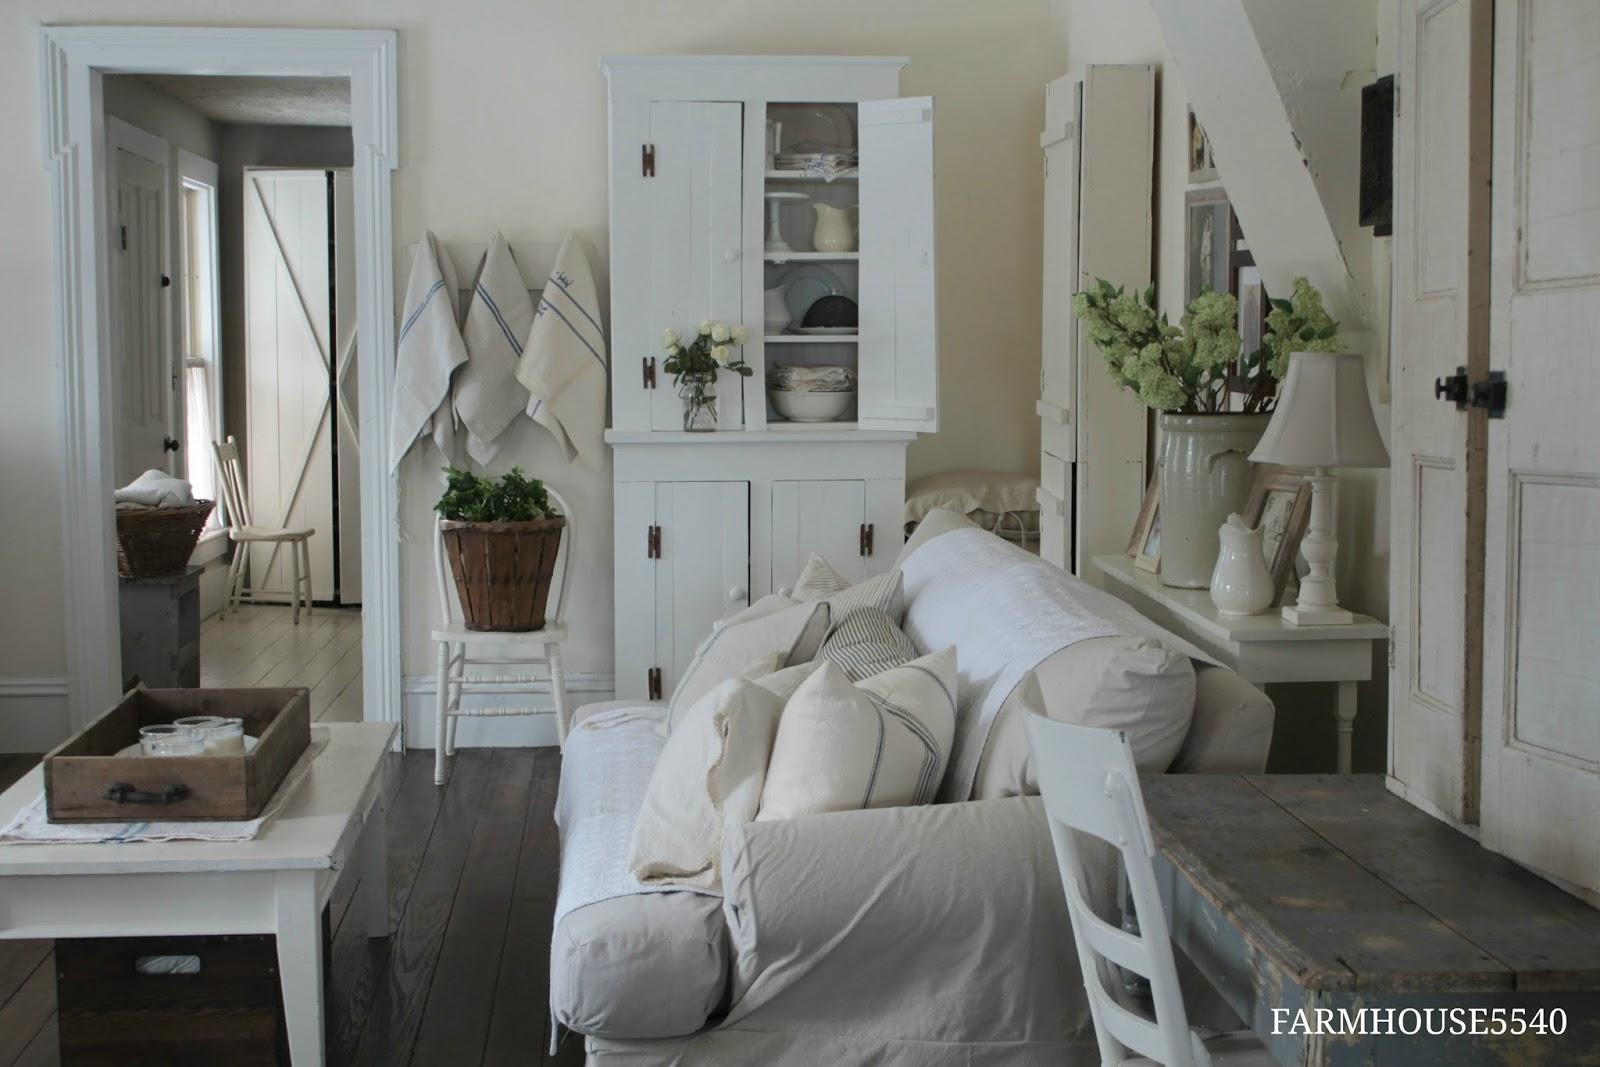 FARMHOUSE 5540: Farmhouse Living Room